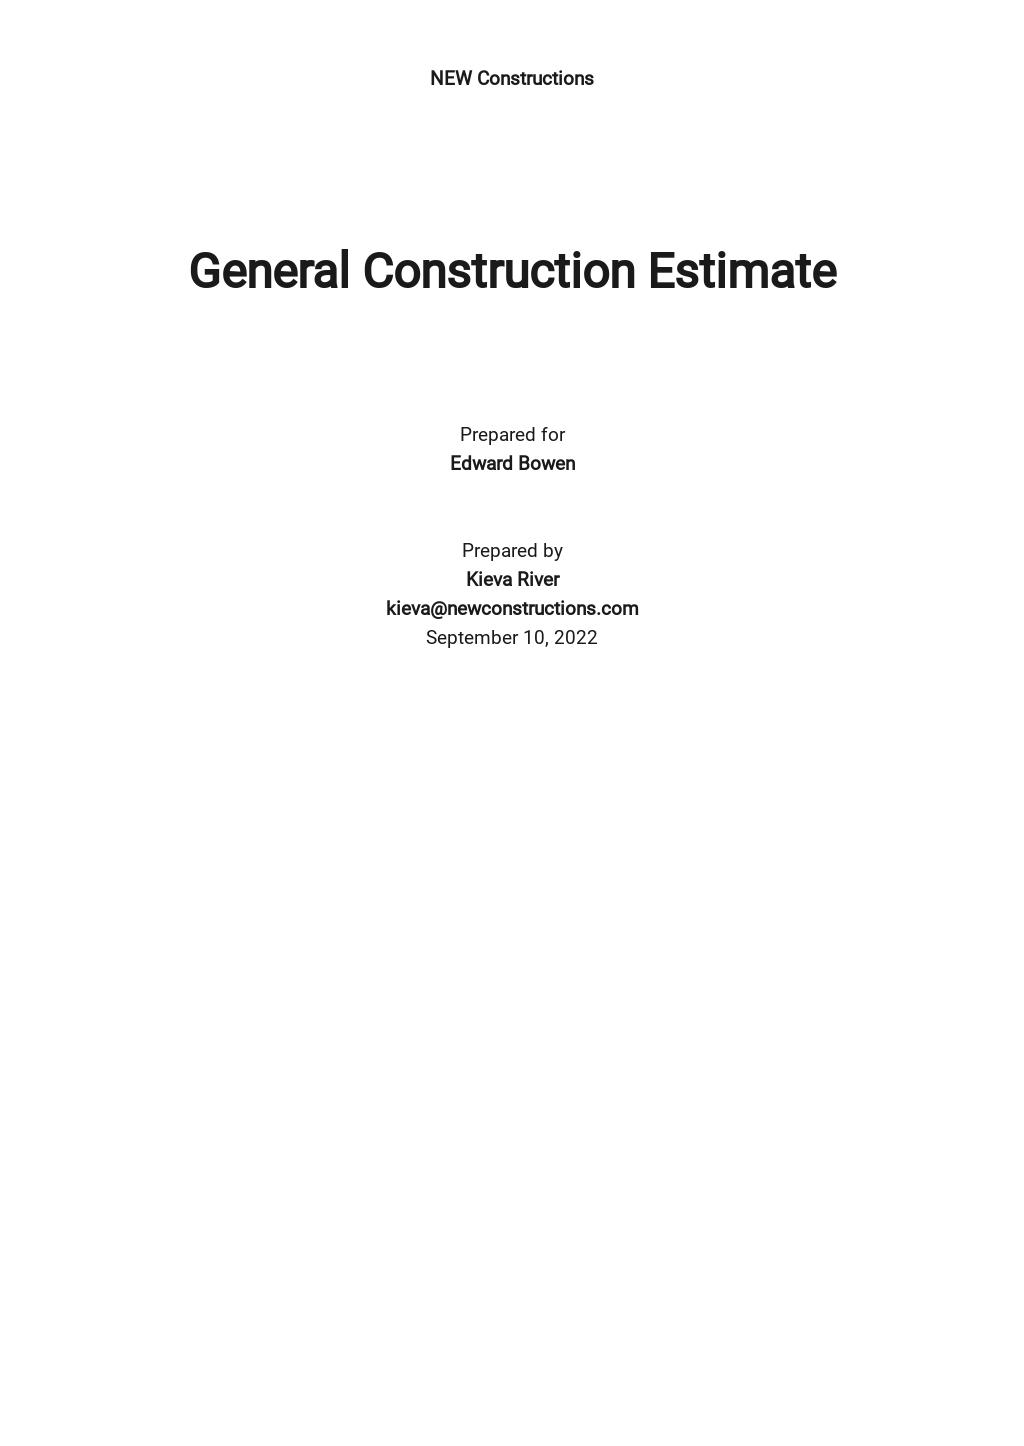 General Construction Estimate Template